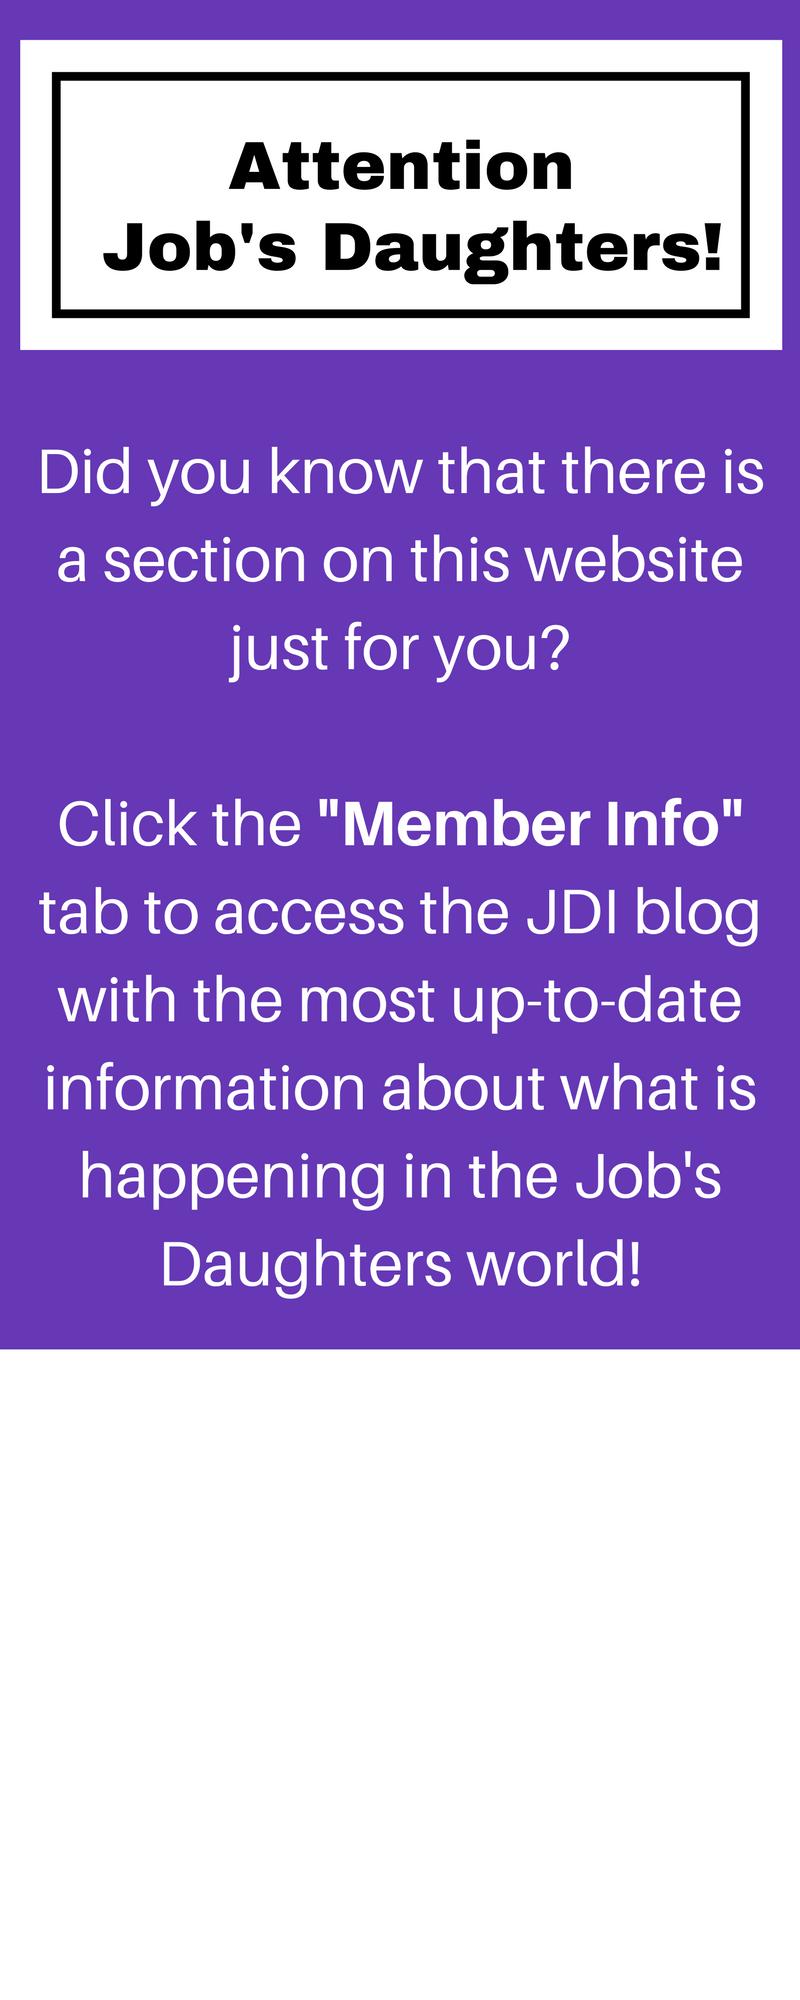 JDI dating τηλέφωνο Ιαπωνία dating τελωνεία